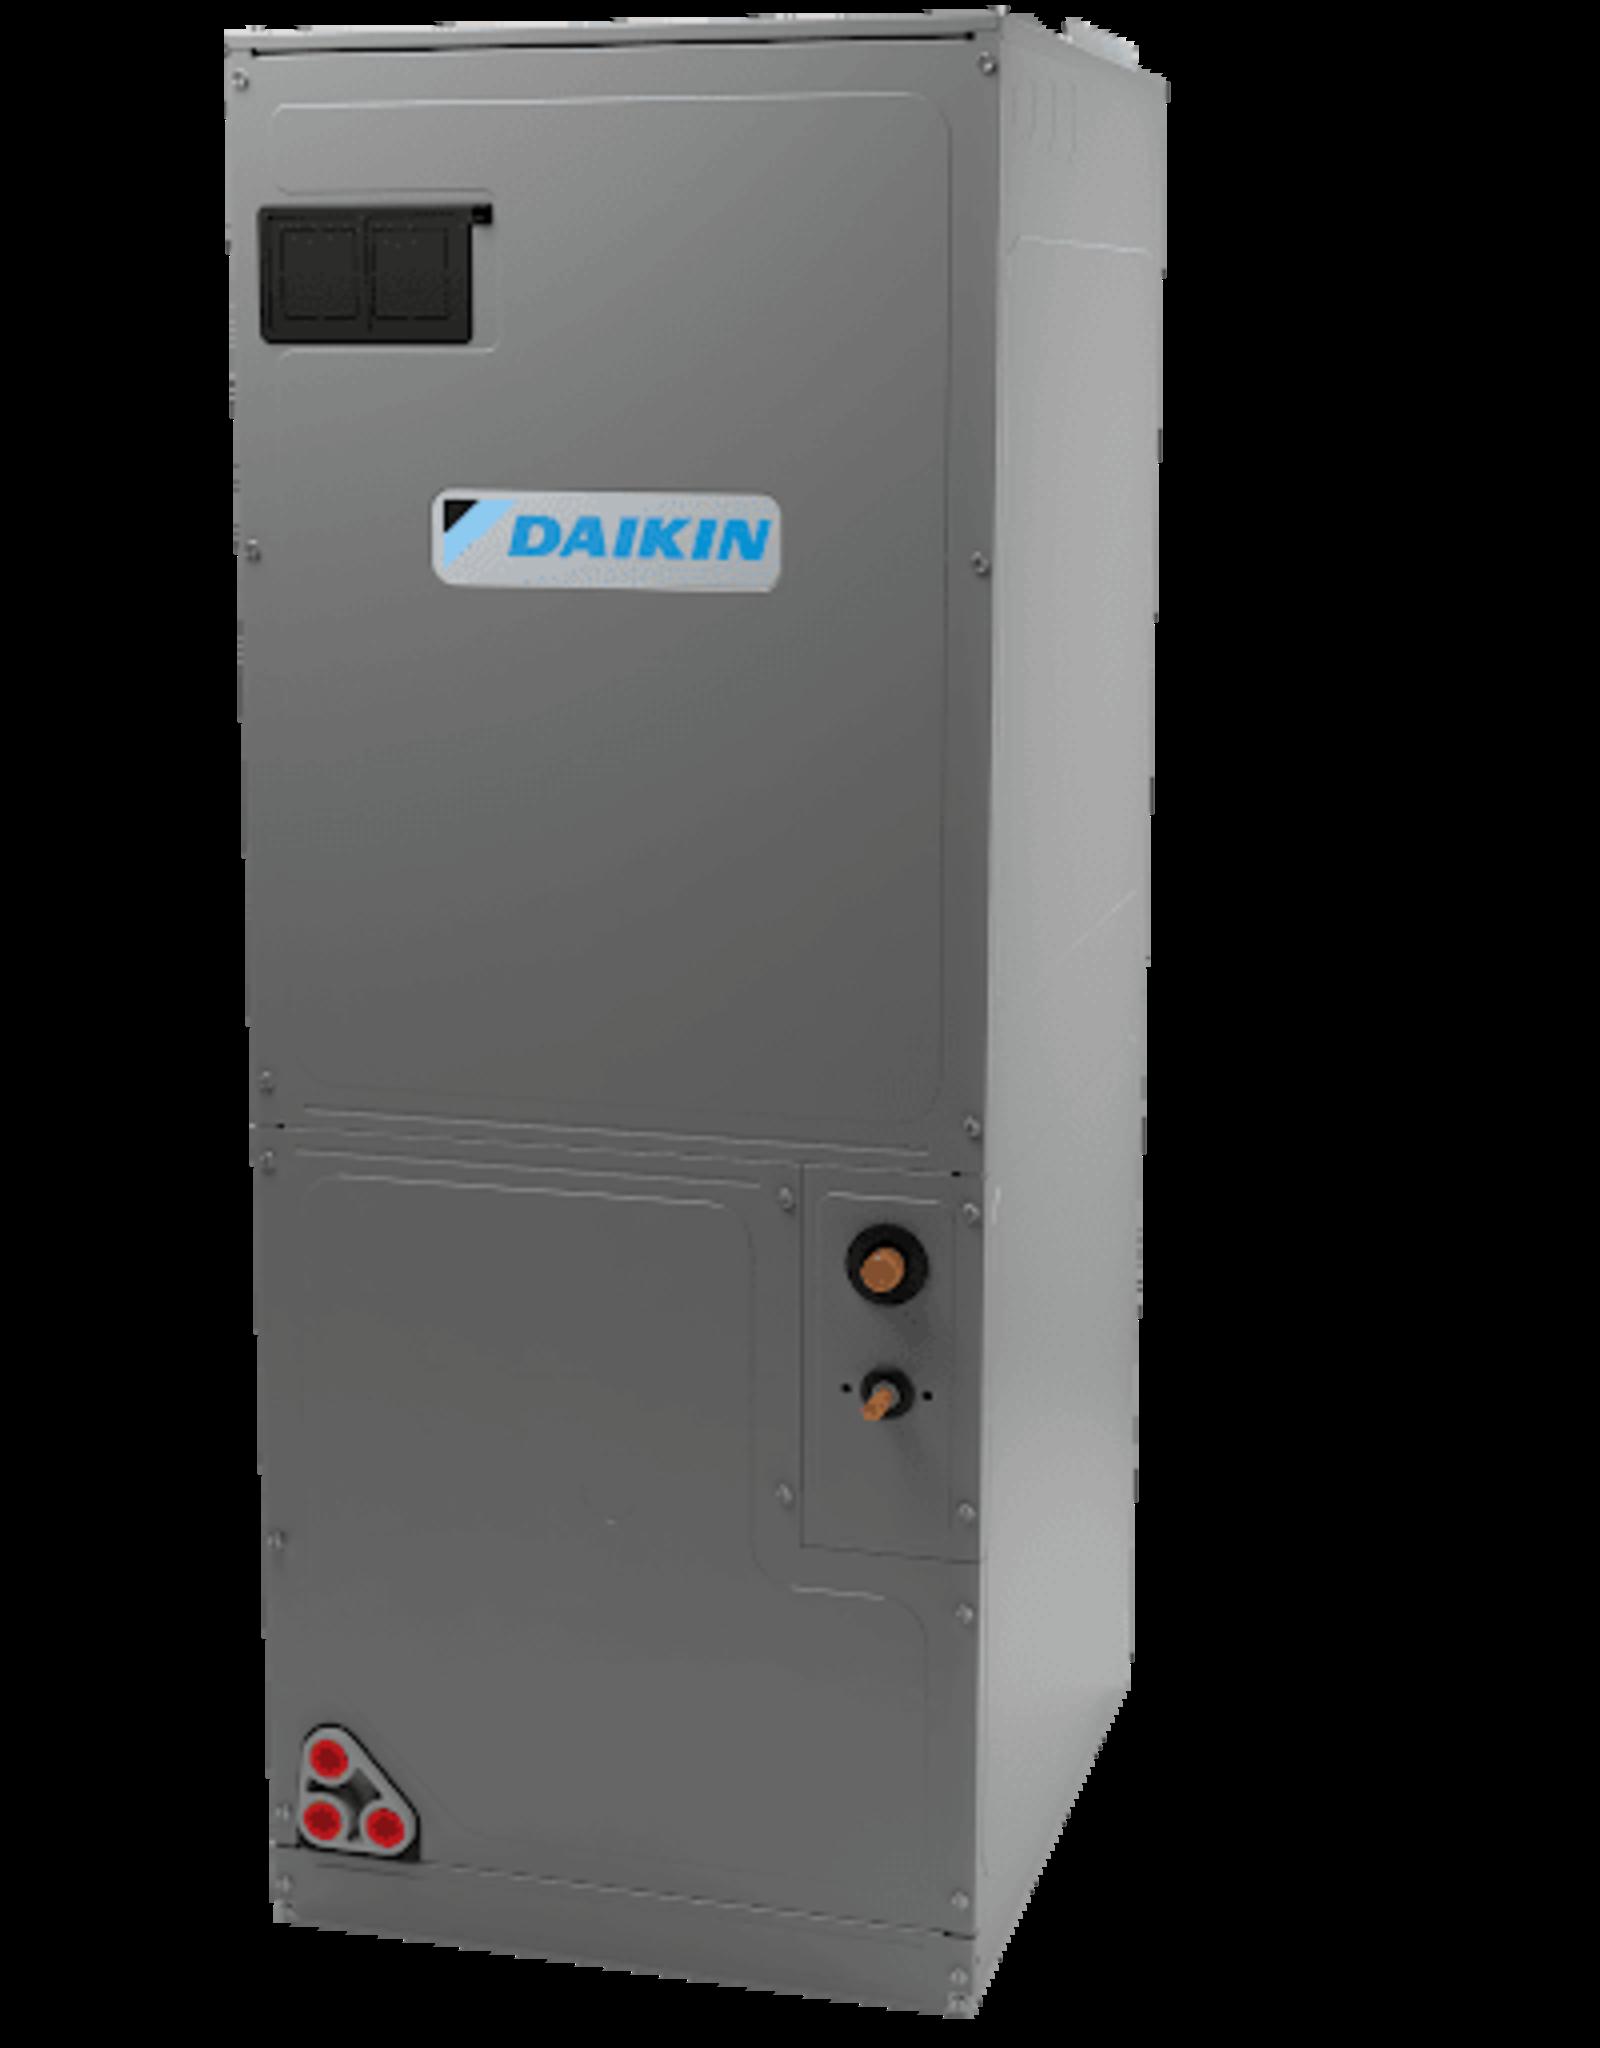 Daikin Applied Americas SkyAir FTQ Cooling/HeatPump Single Zone Ducted Unitary AHU - 208/230 - 1ph